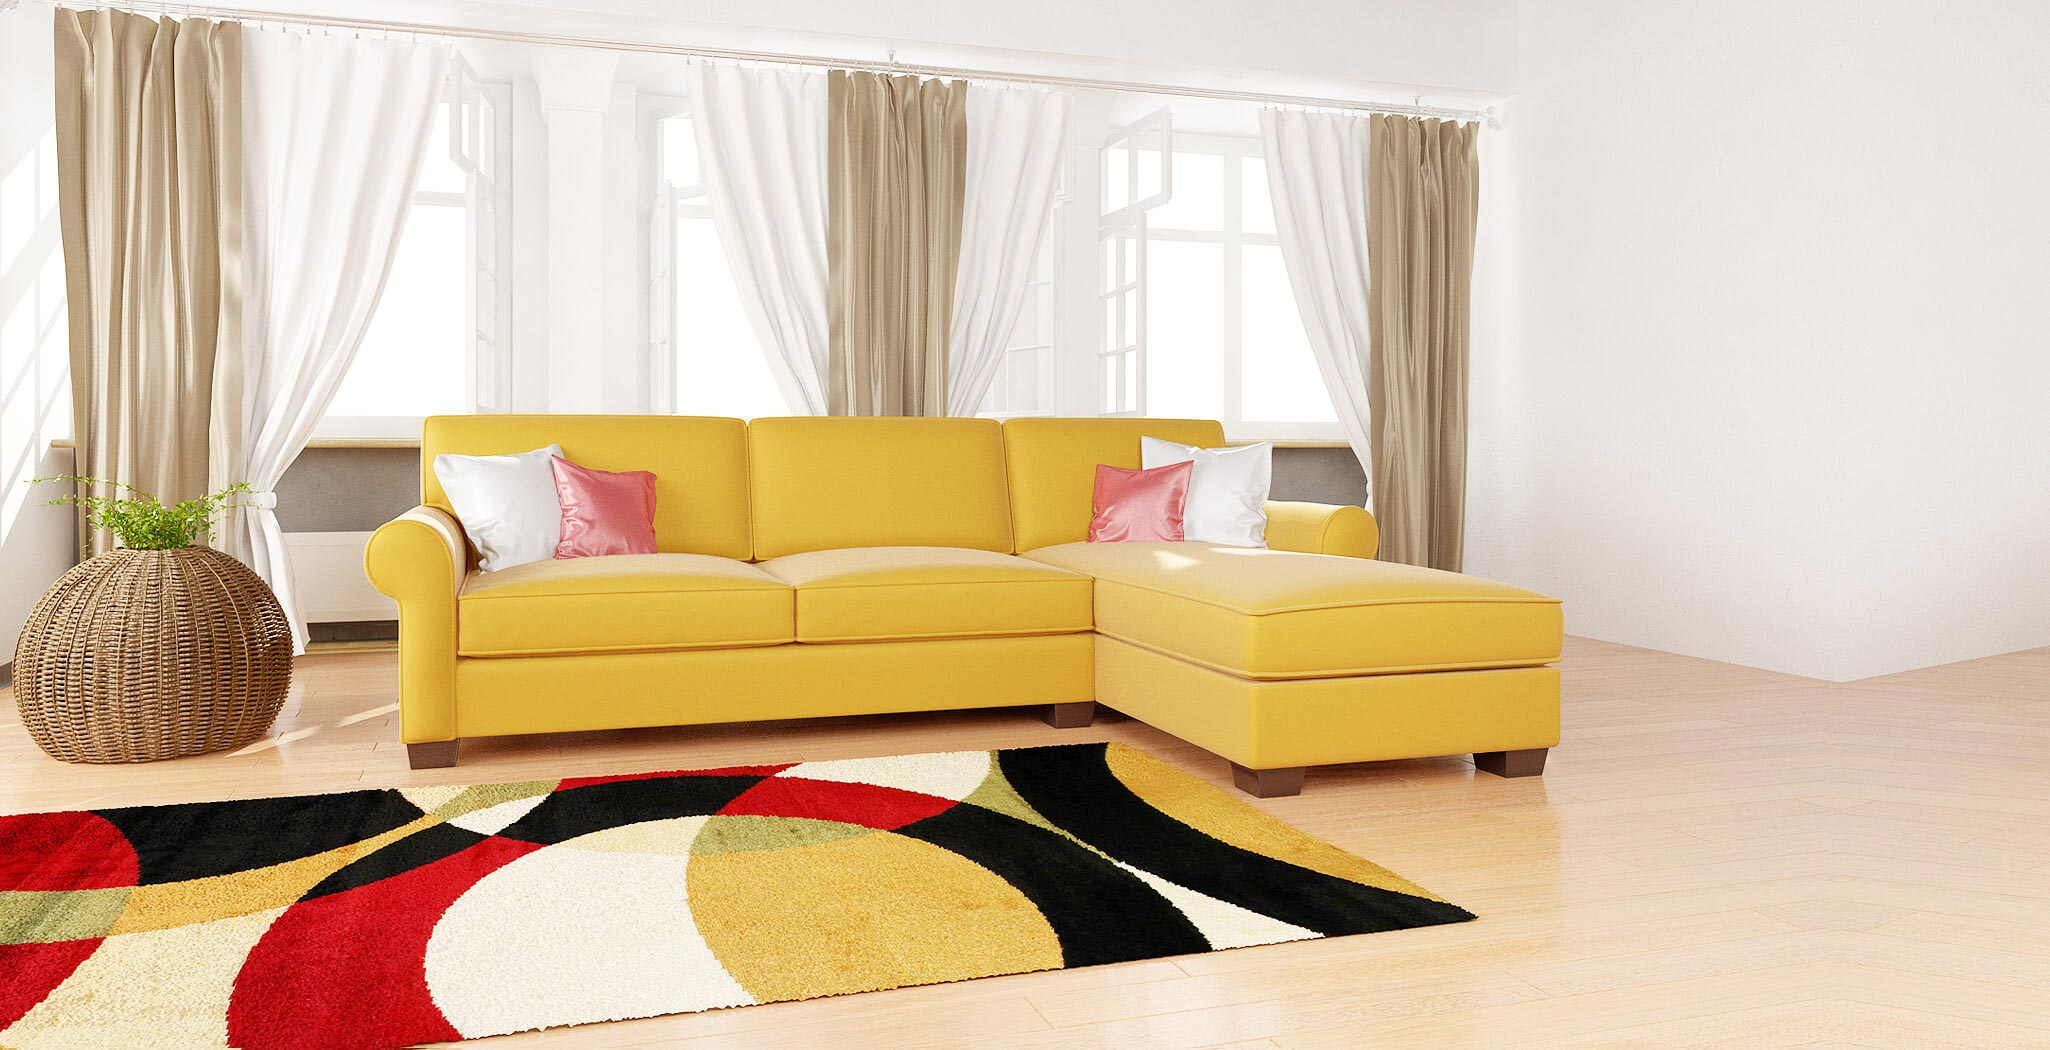 isabel panel furniture gallery 5